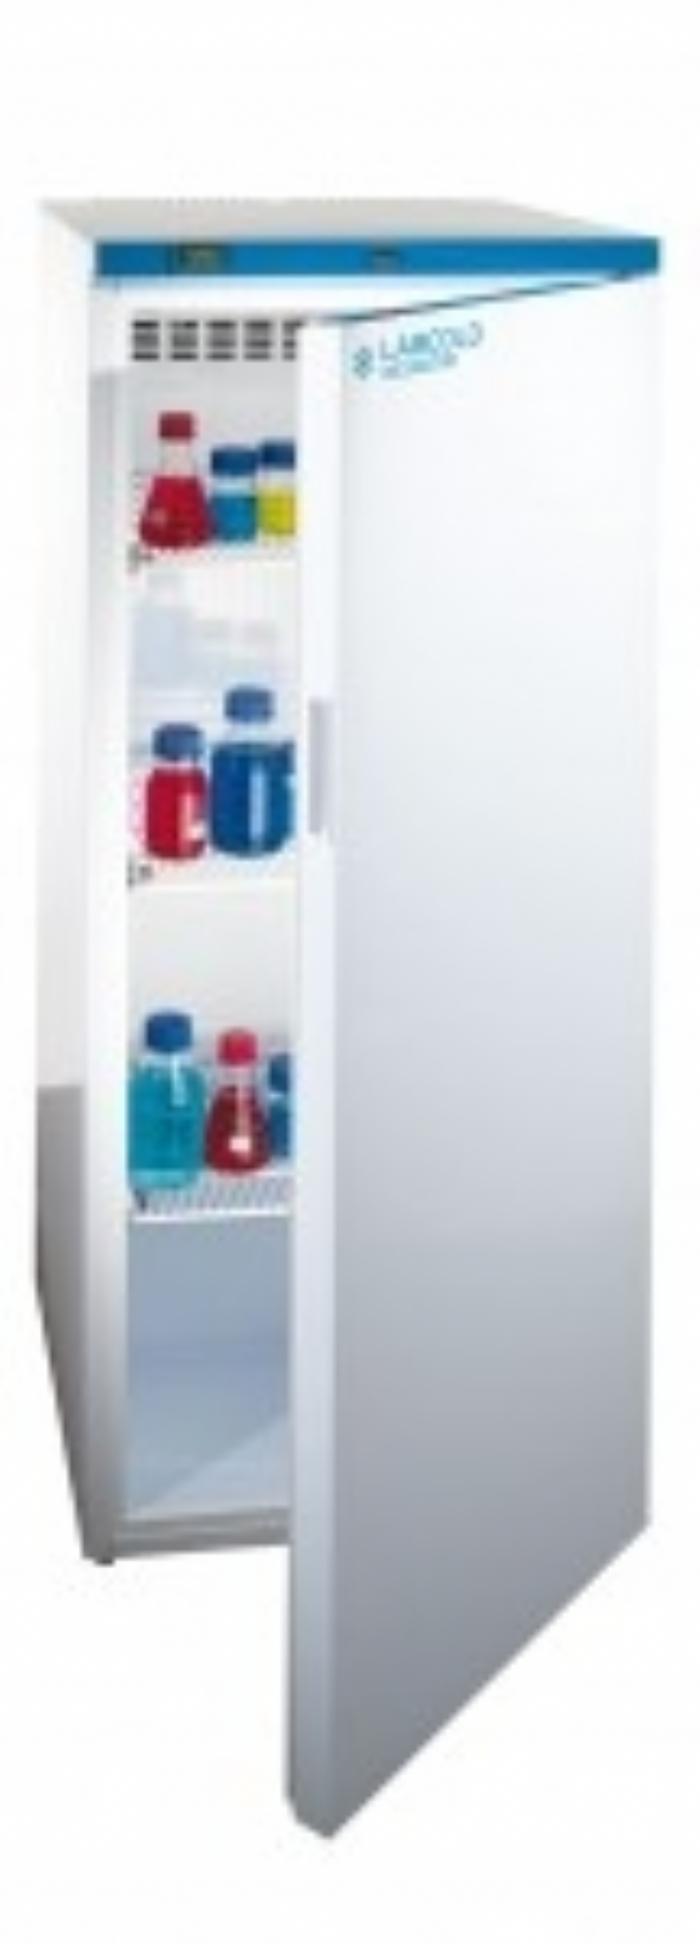 LabCold Cooled Incubator Solid Door 300L RLSD0300